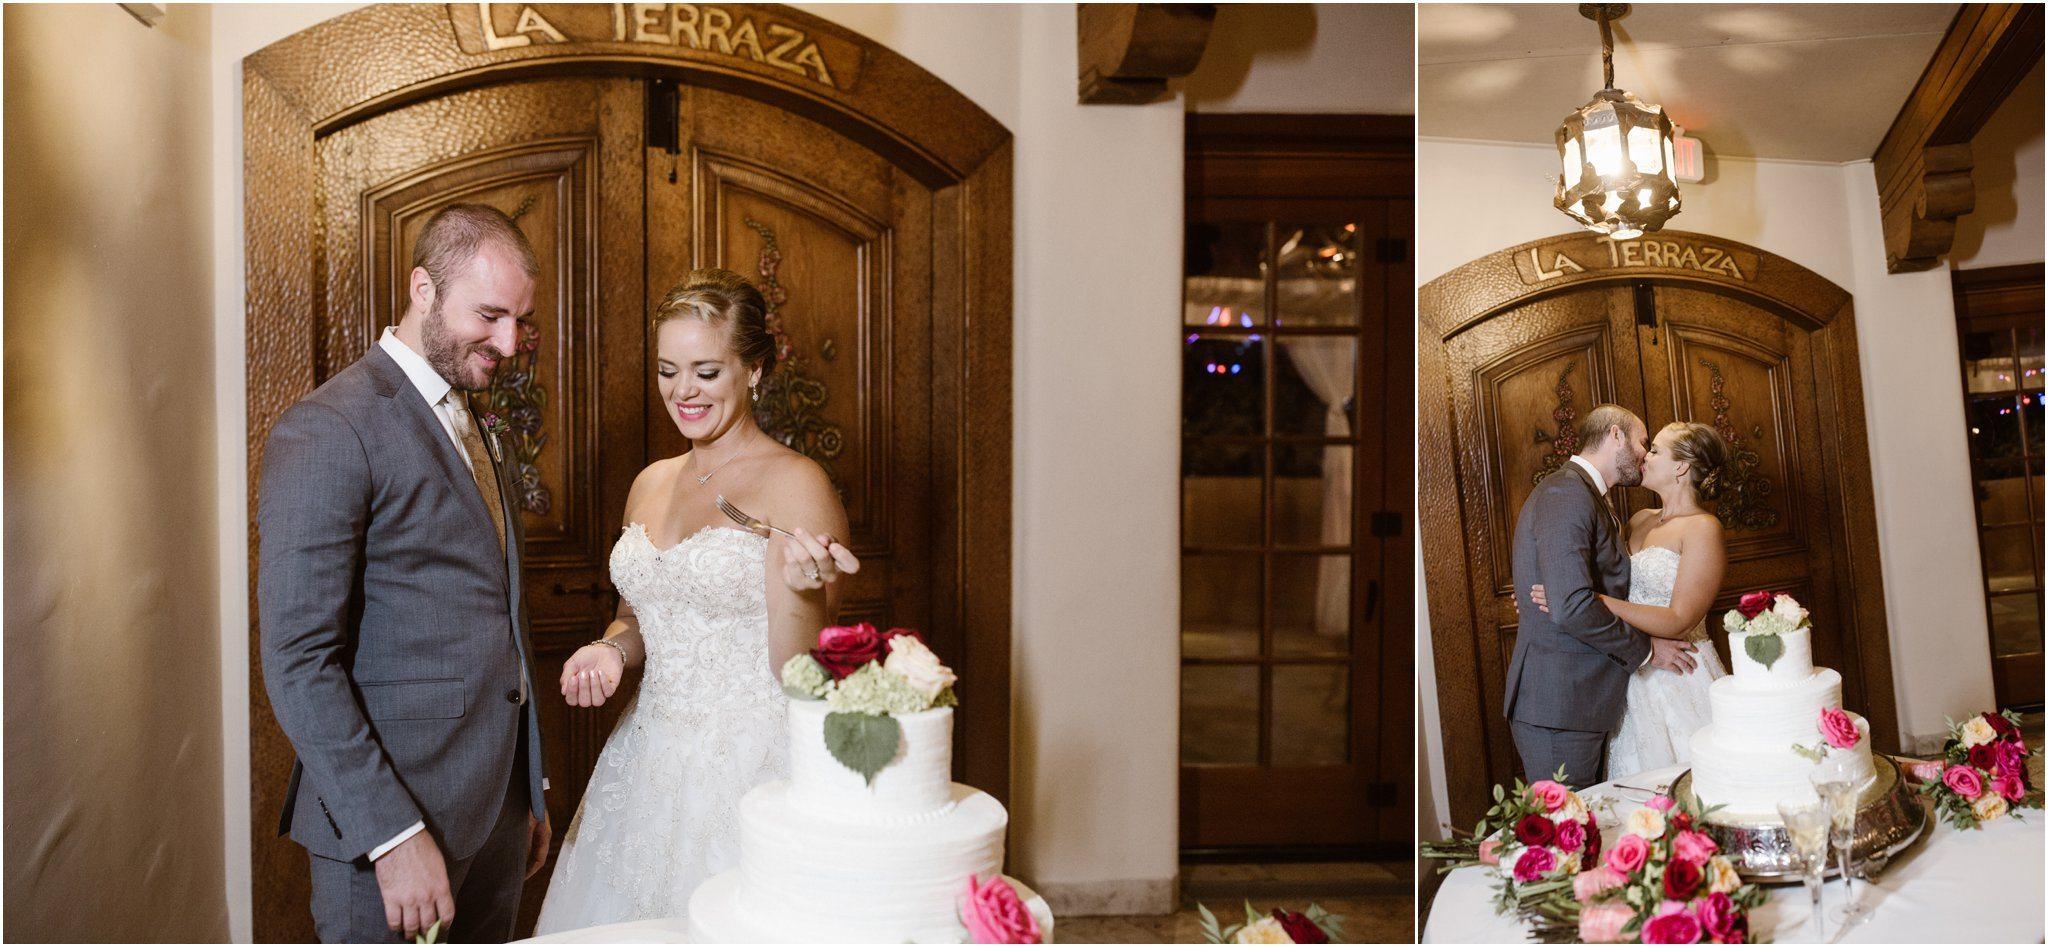 0080albuquerque-wedding-photographer_-santa-fe-wedding-photographer_-southwest-wedding-photography_-blue-rose-studio